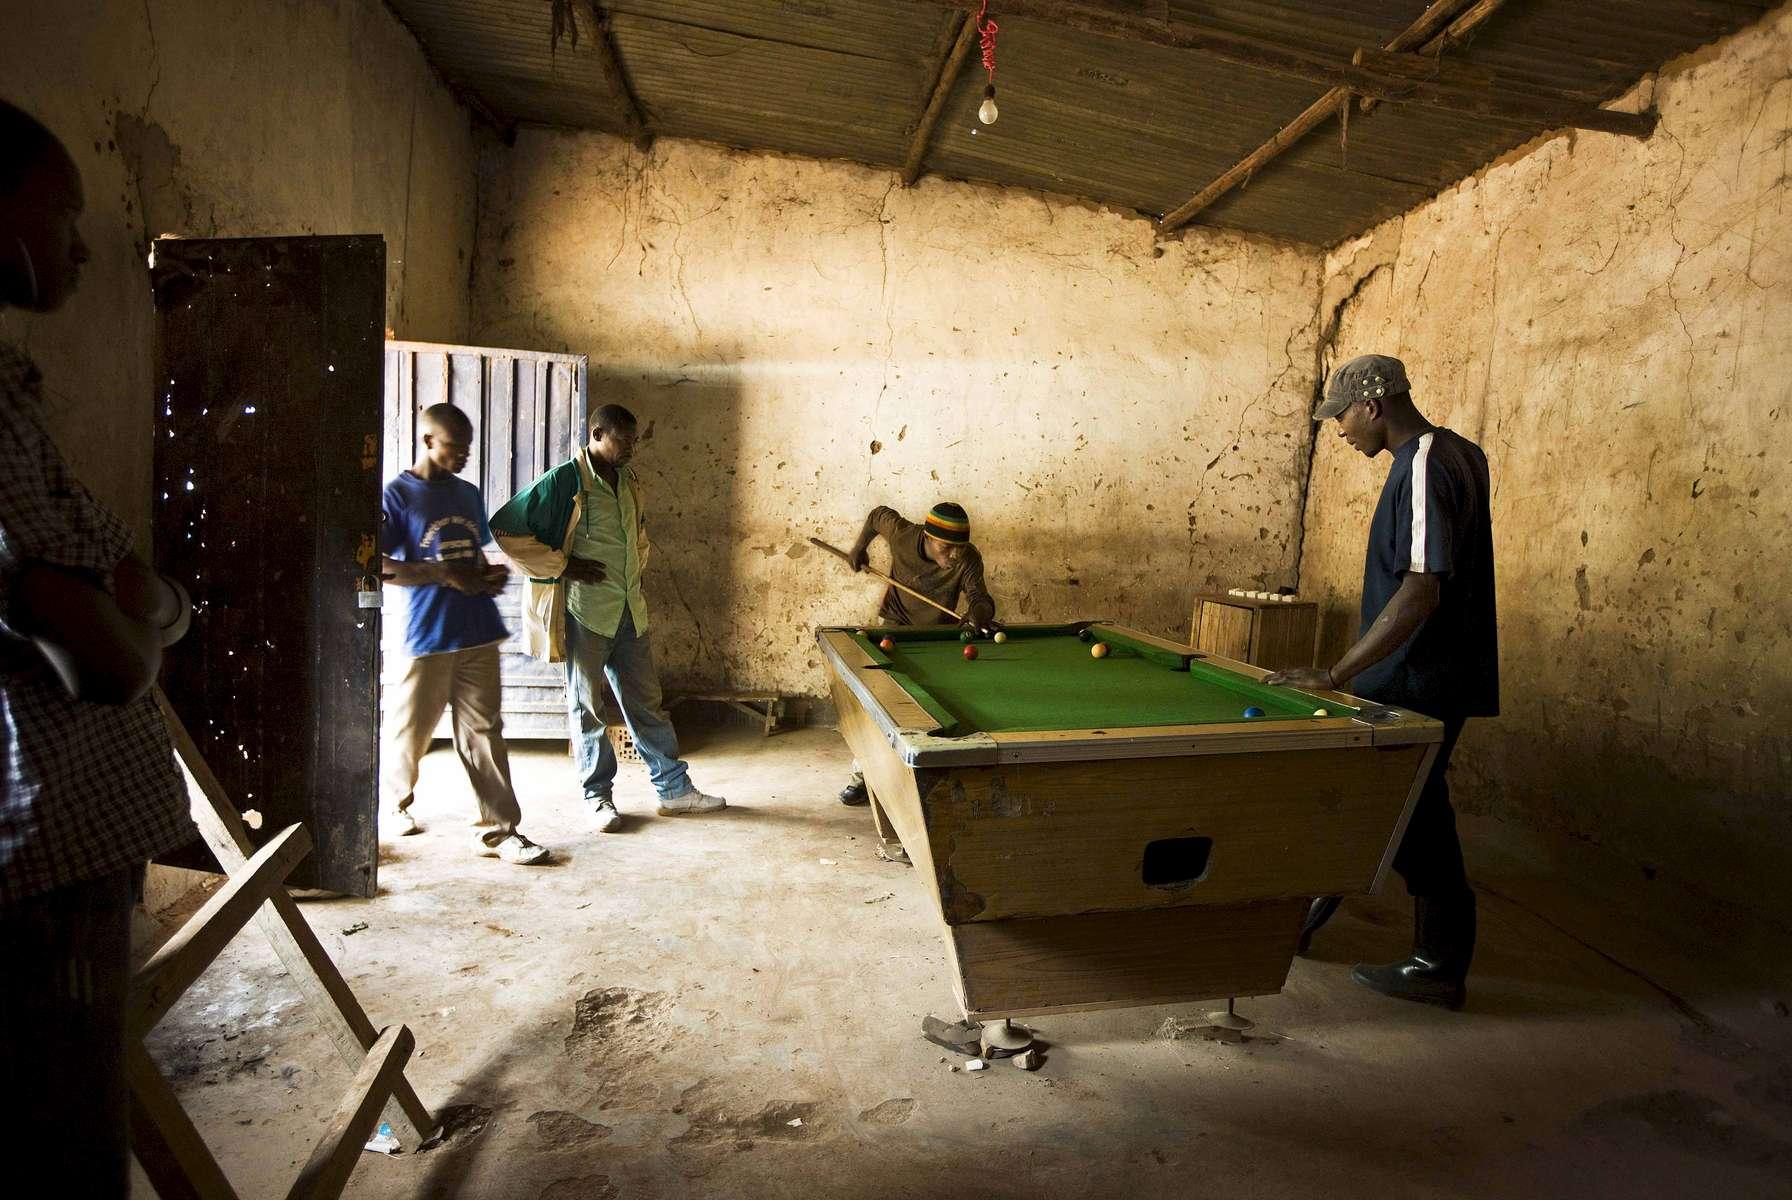 Pool Hall, Kigali, Rwanda